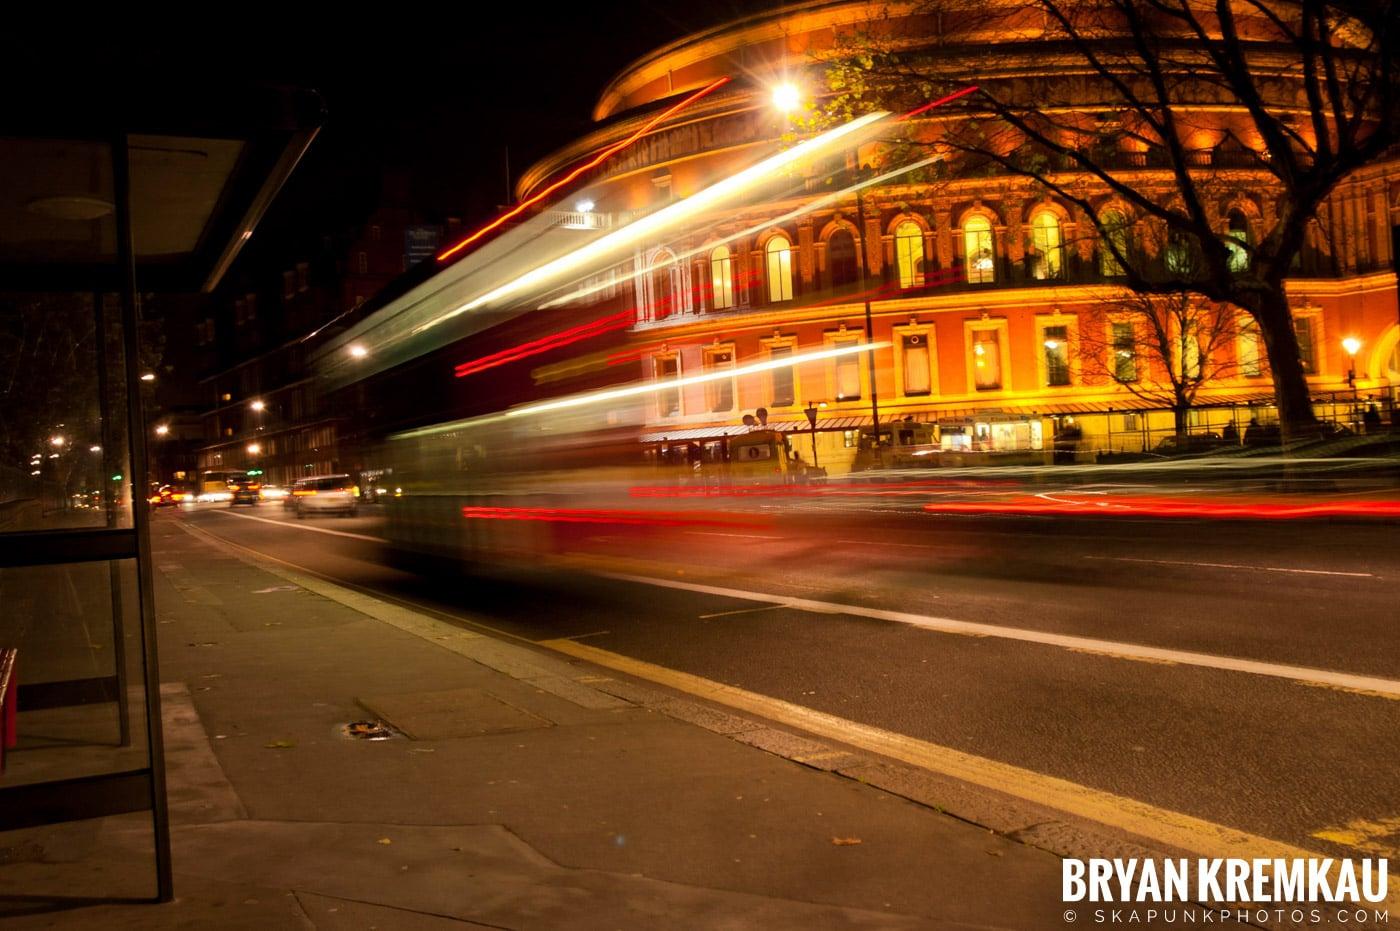 London, England - Day 1 - 12.8.06 (1)